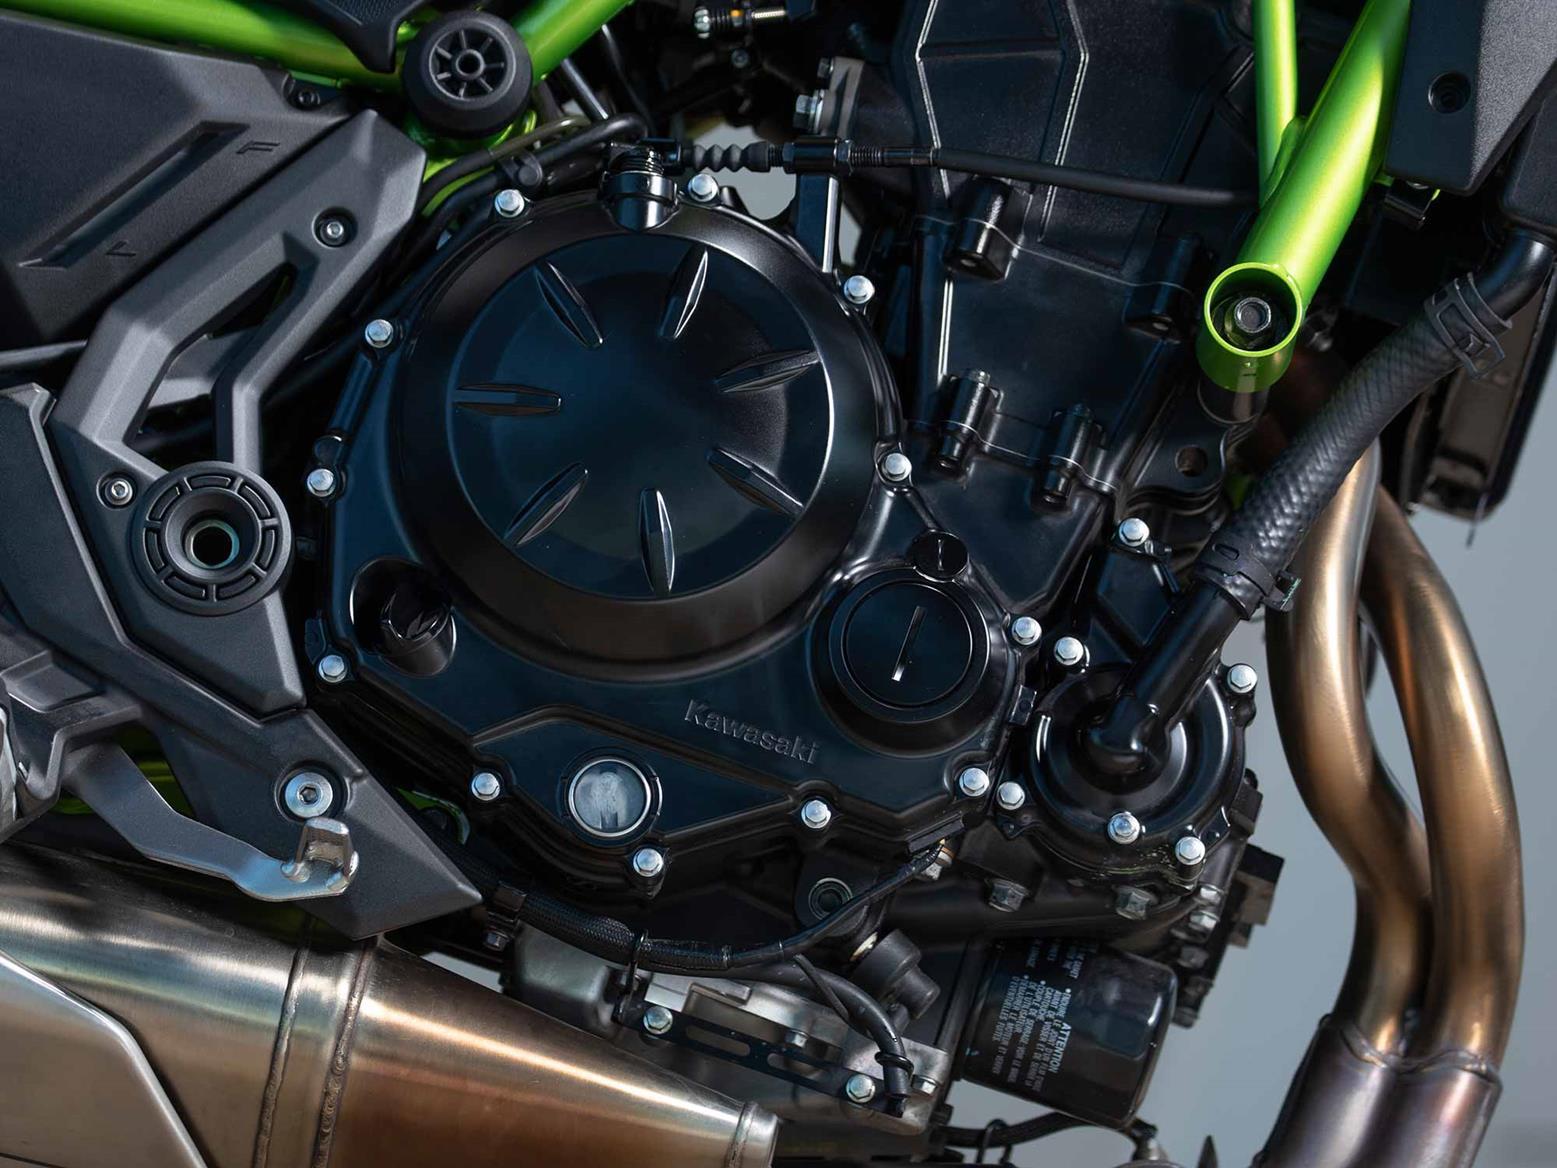 The 2020 Kawasaki Z650 engine is Euro5 compliant